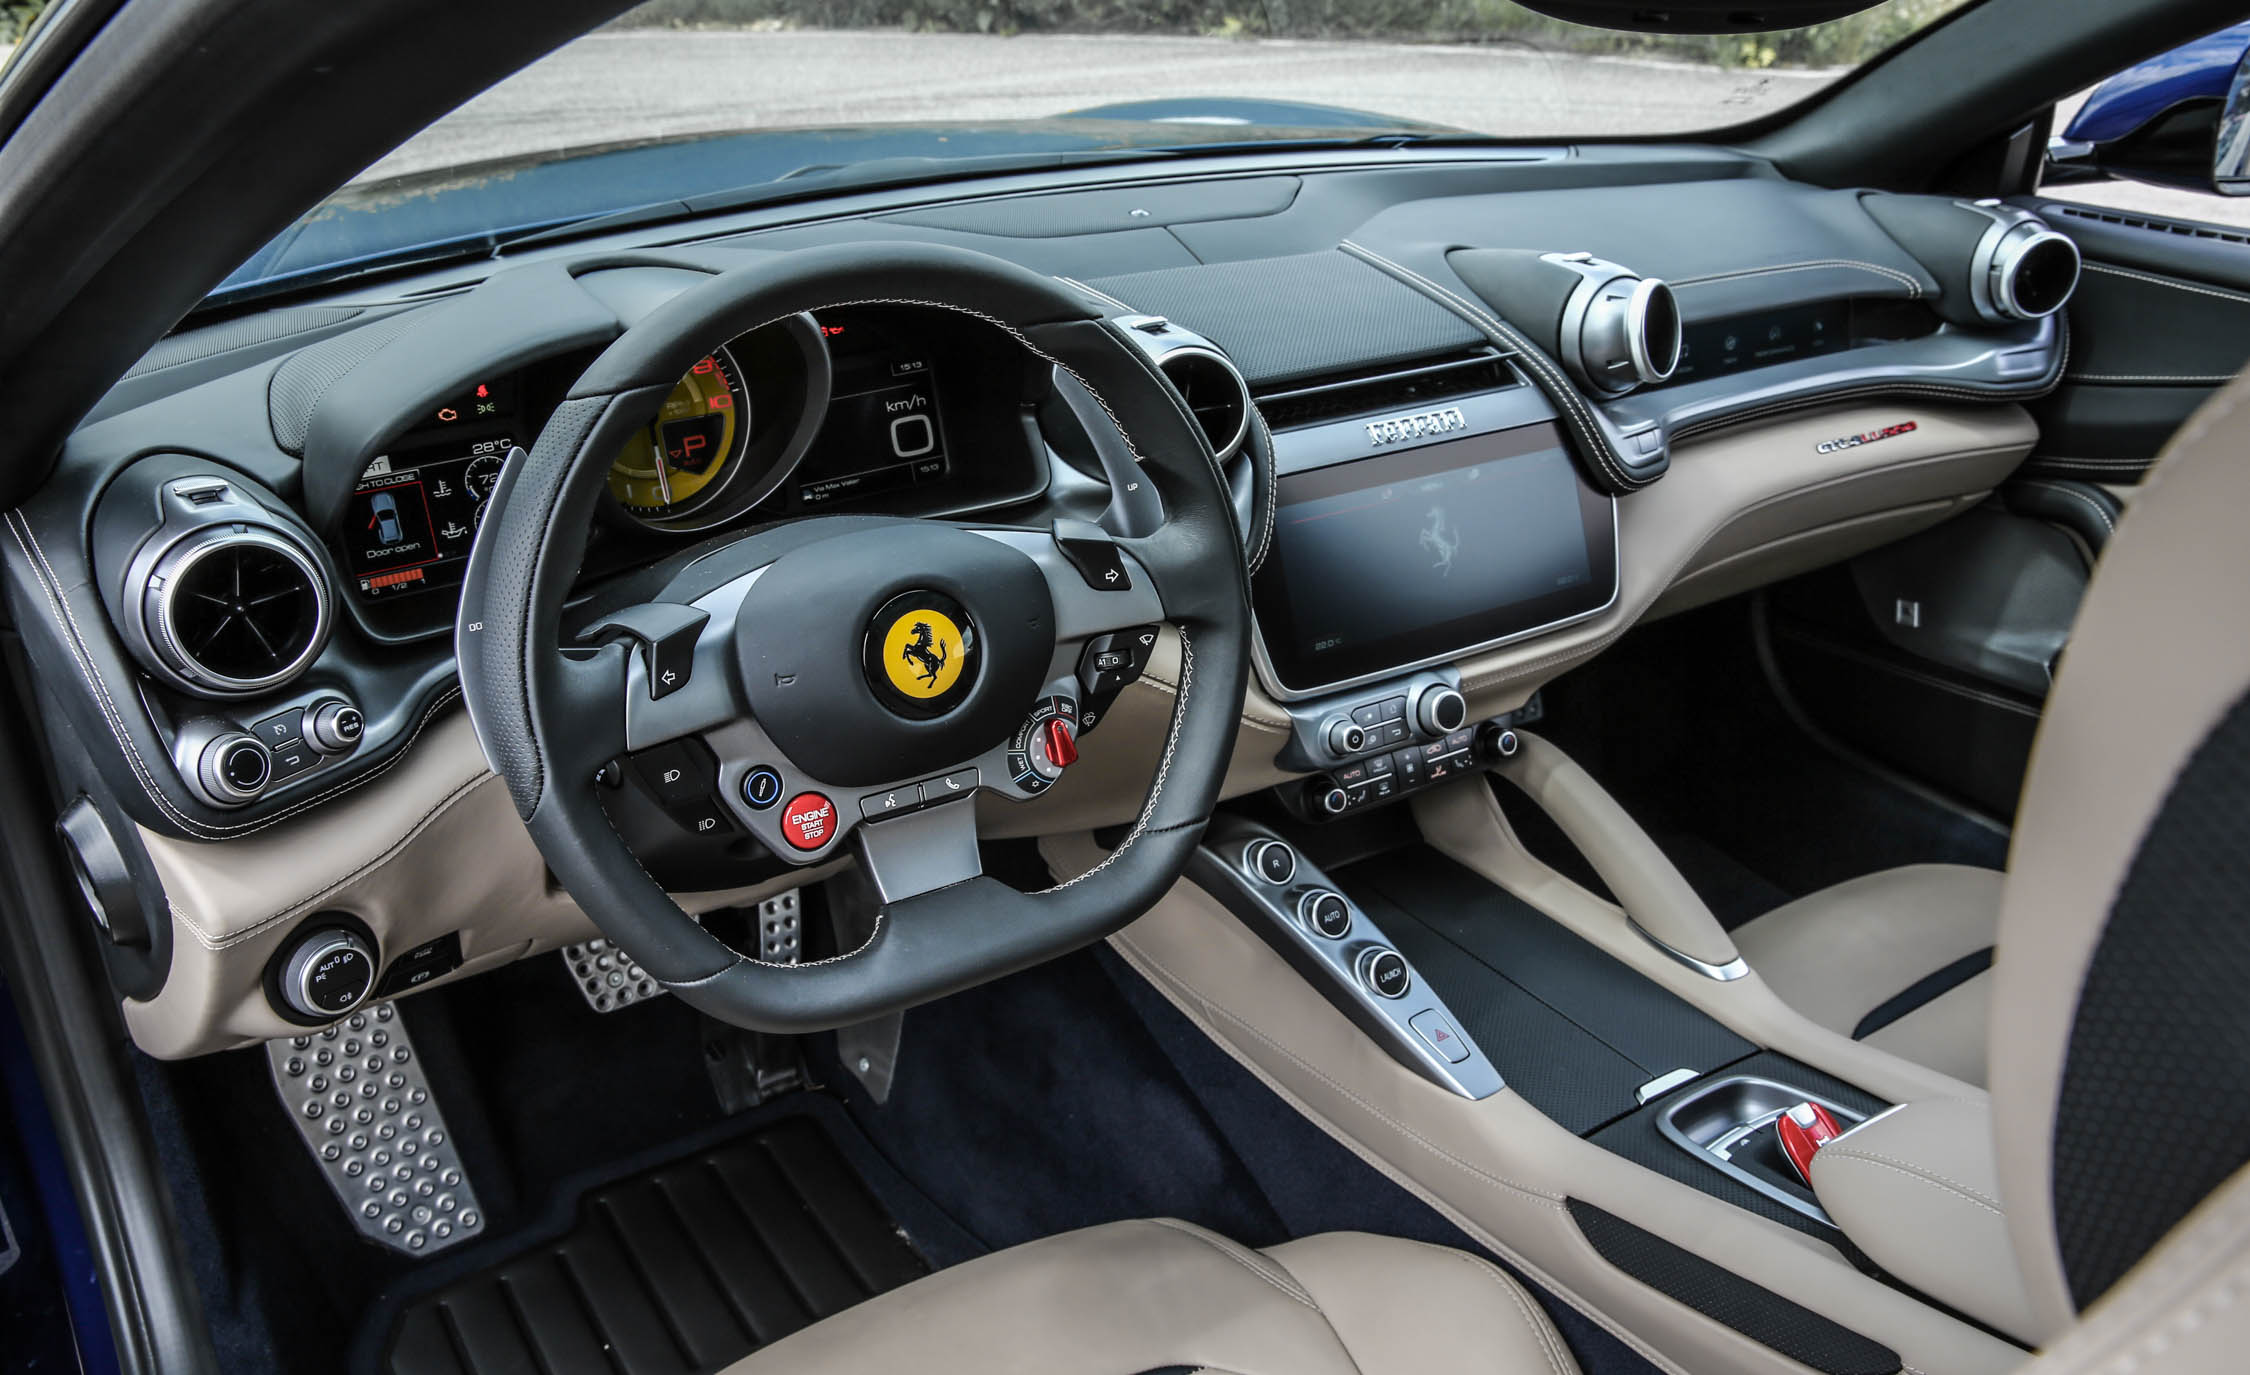 2017 Ferrari GTC4Lusso (View 47 of 52)